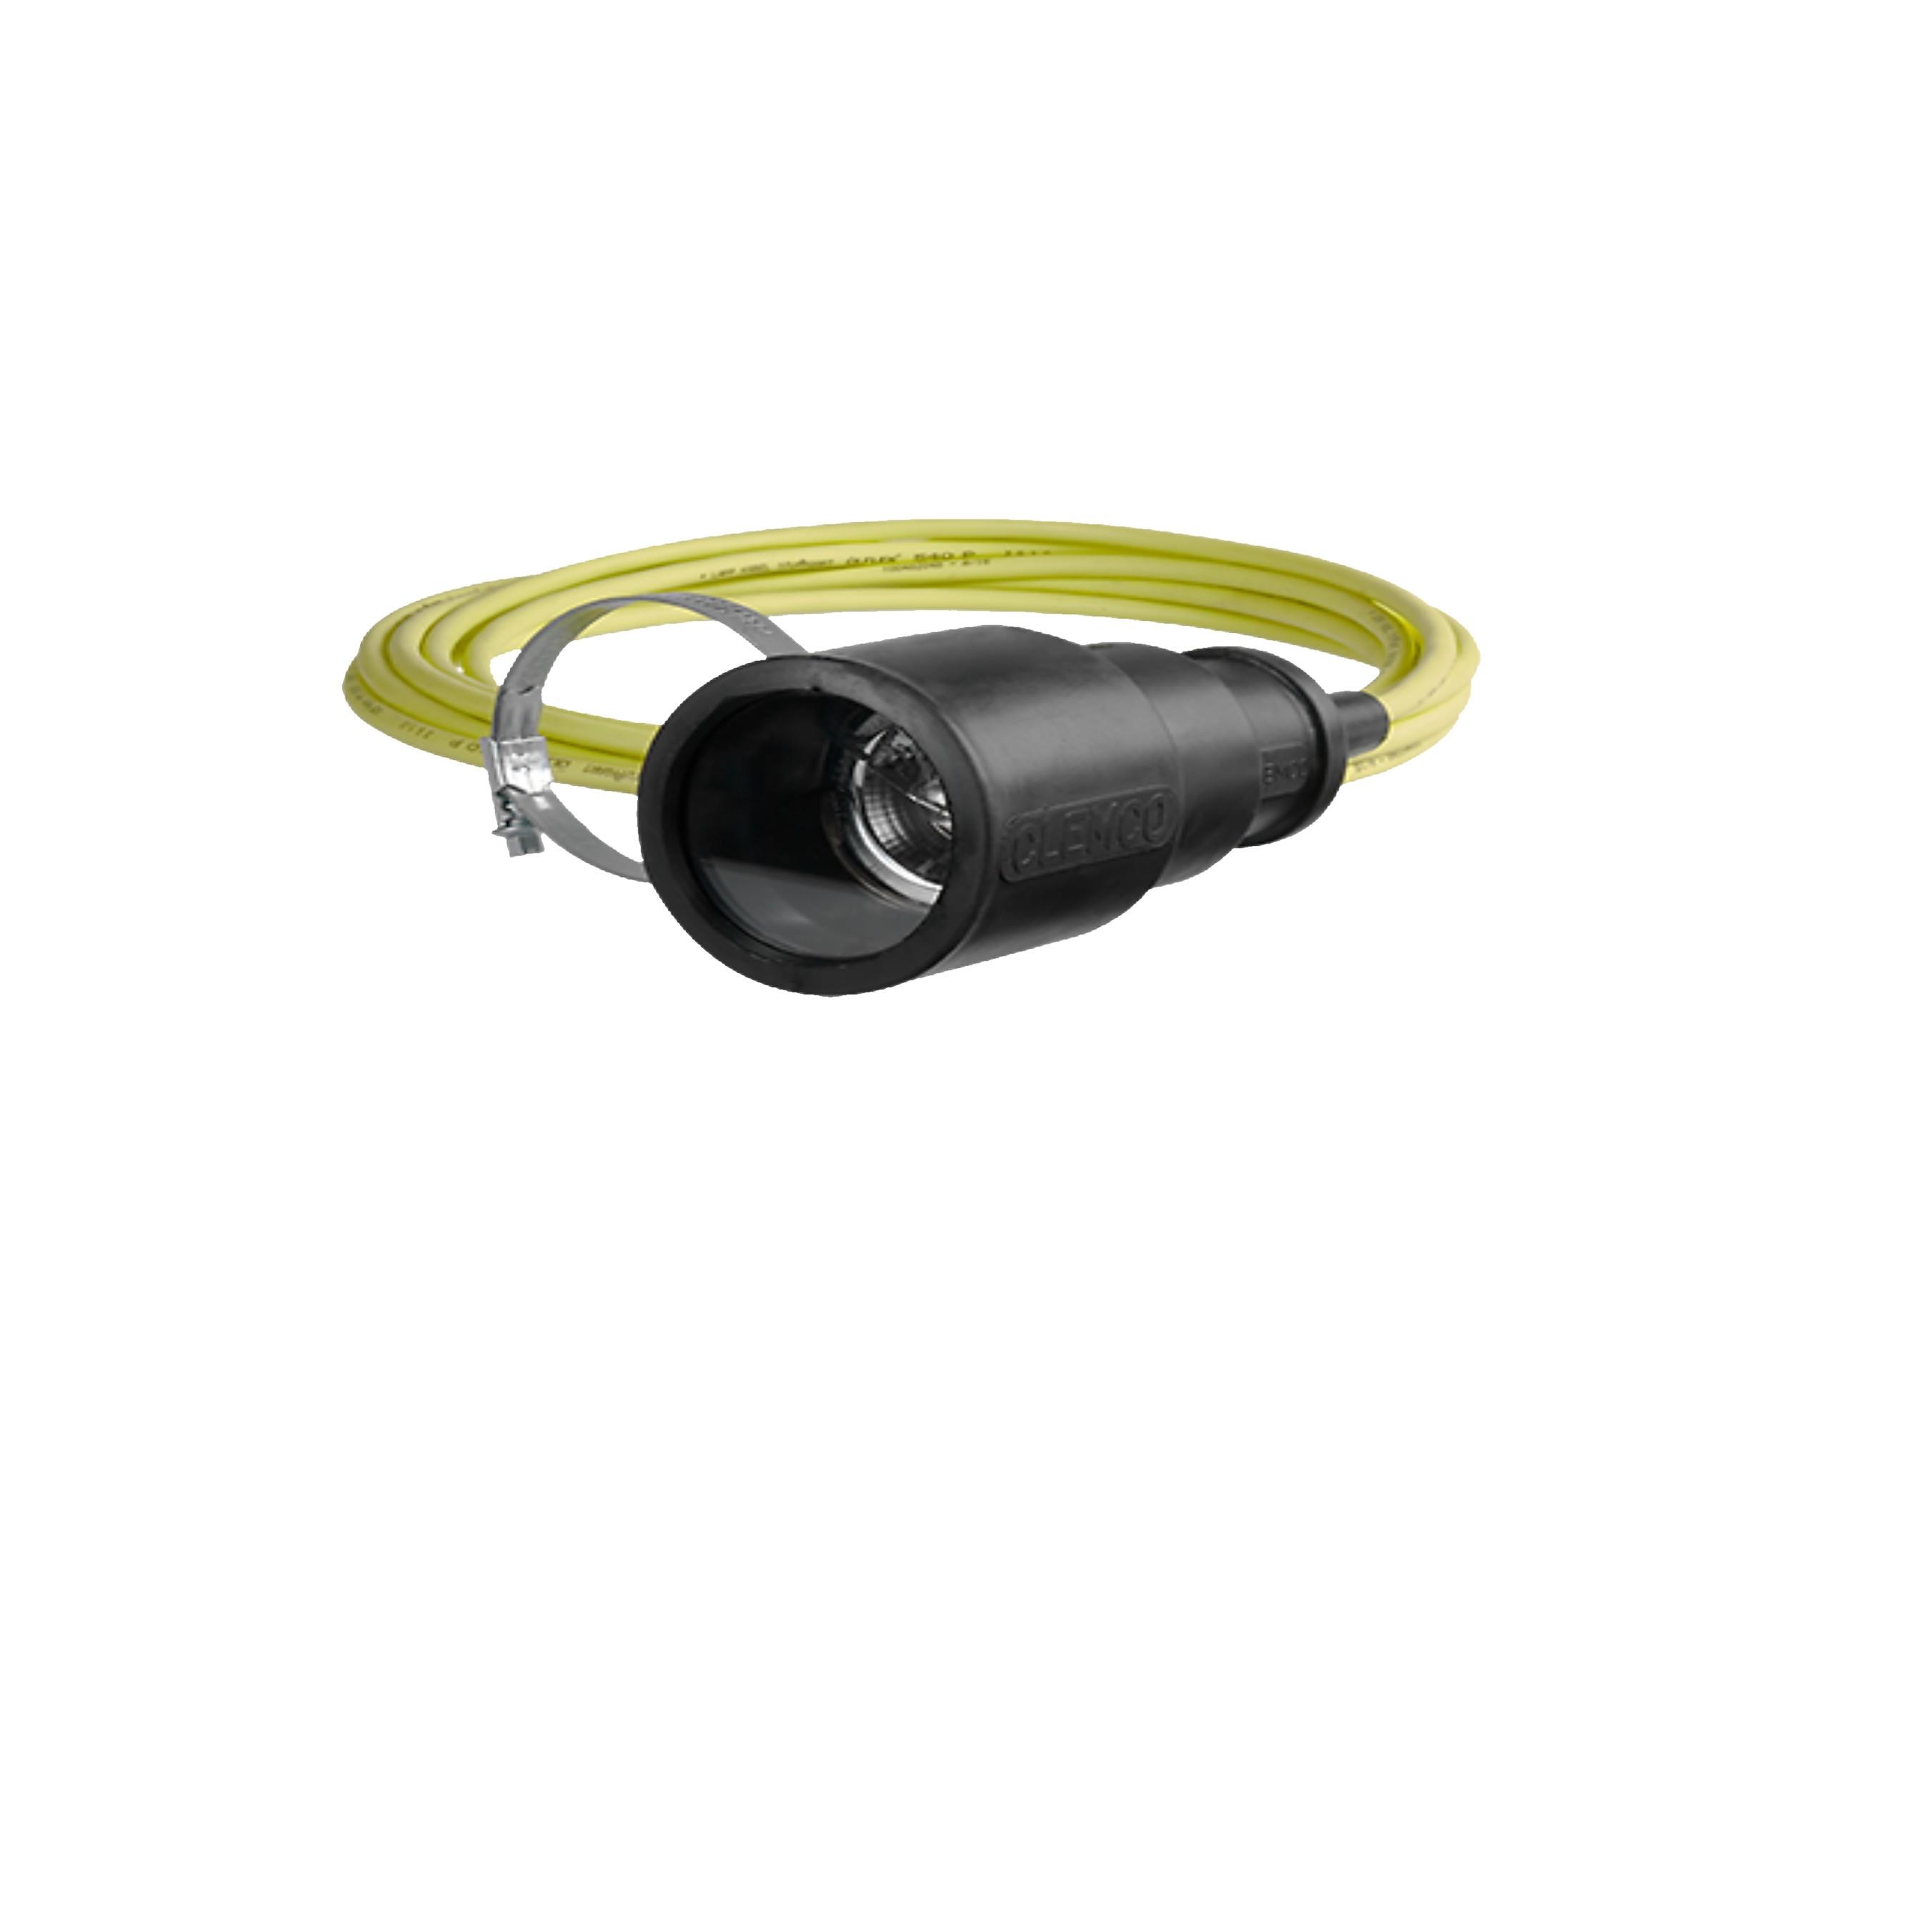 Strahlerlampe 12V/20 W m. 5m Kabel (ohne Stecker)